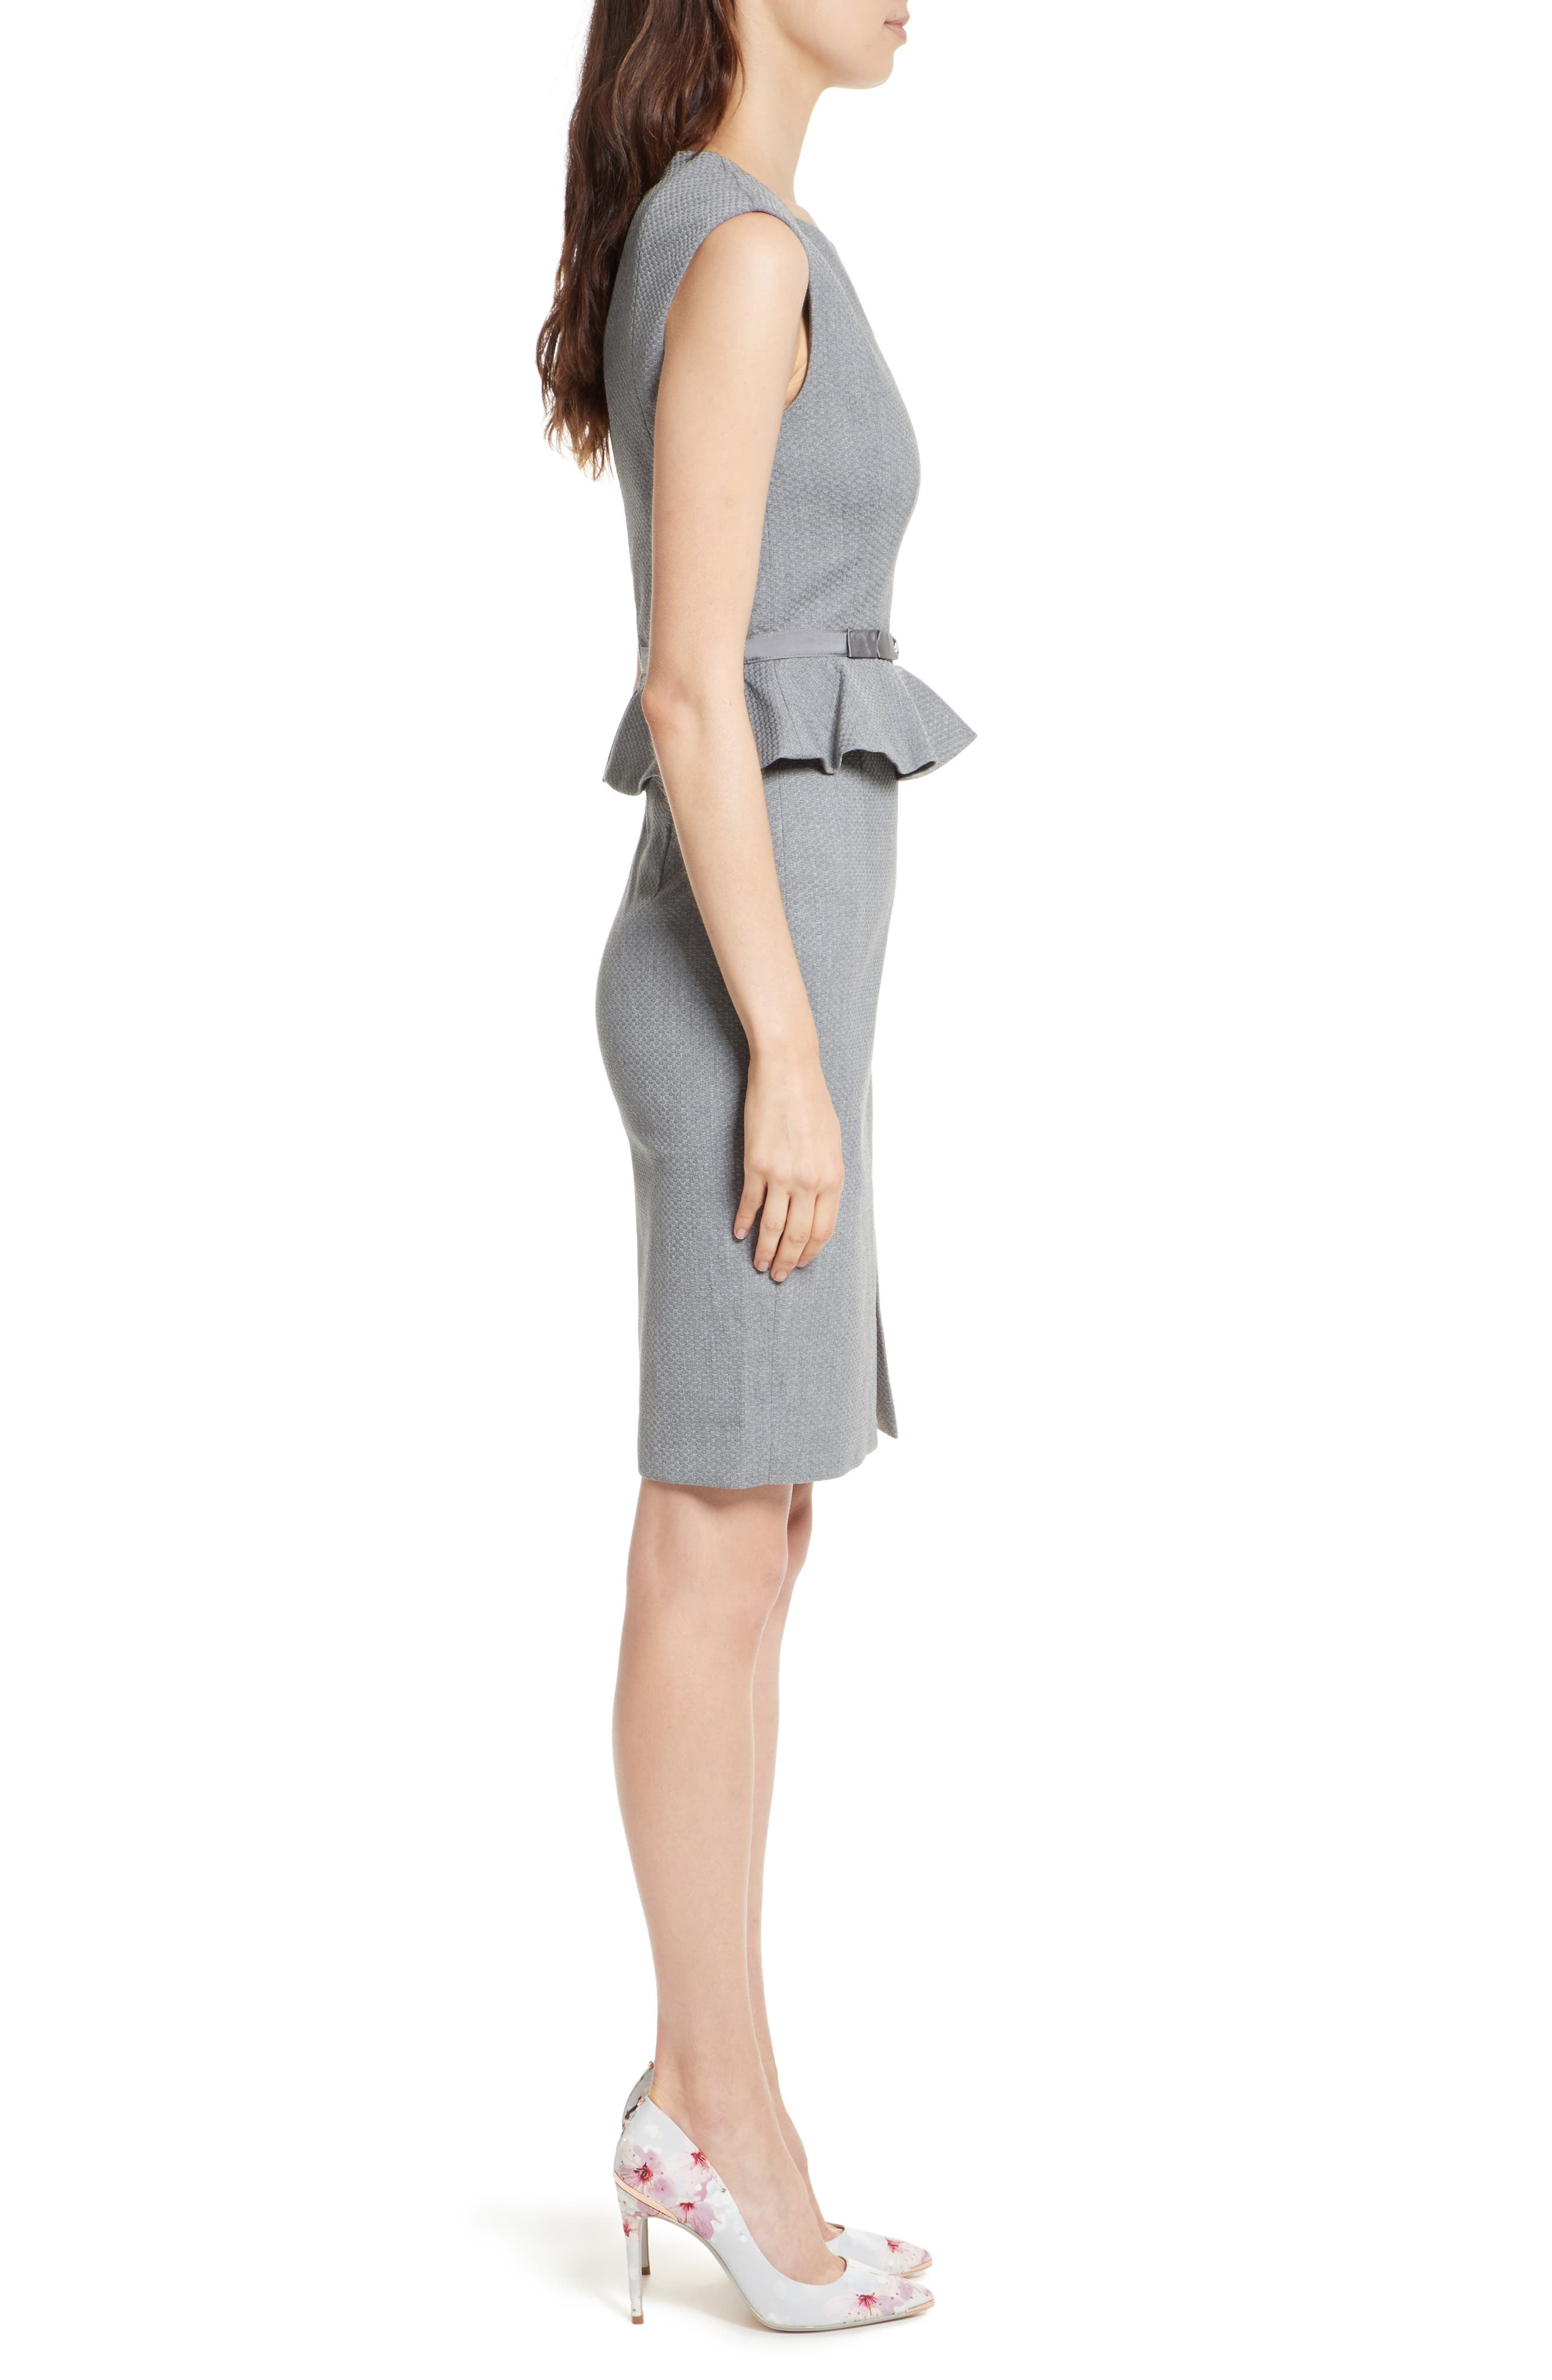 Nadaed Bow Detail Textured Peplum Dress,                             Alternate thumbnail 3, color,                             Mid Grey